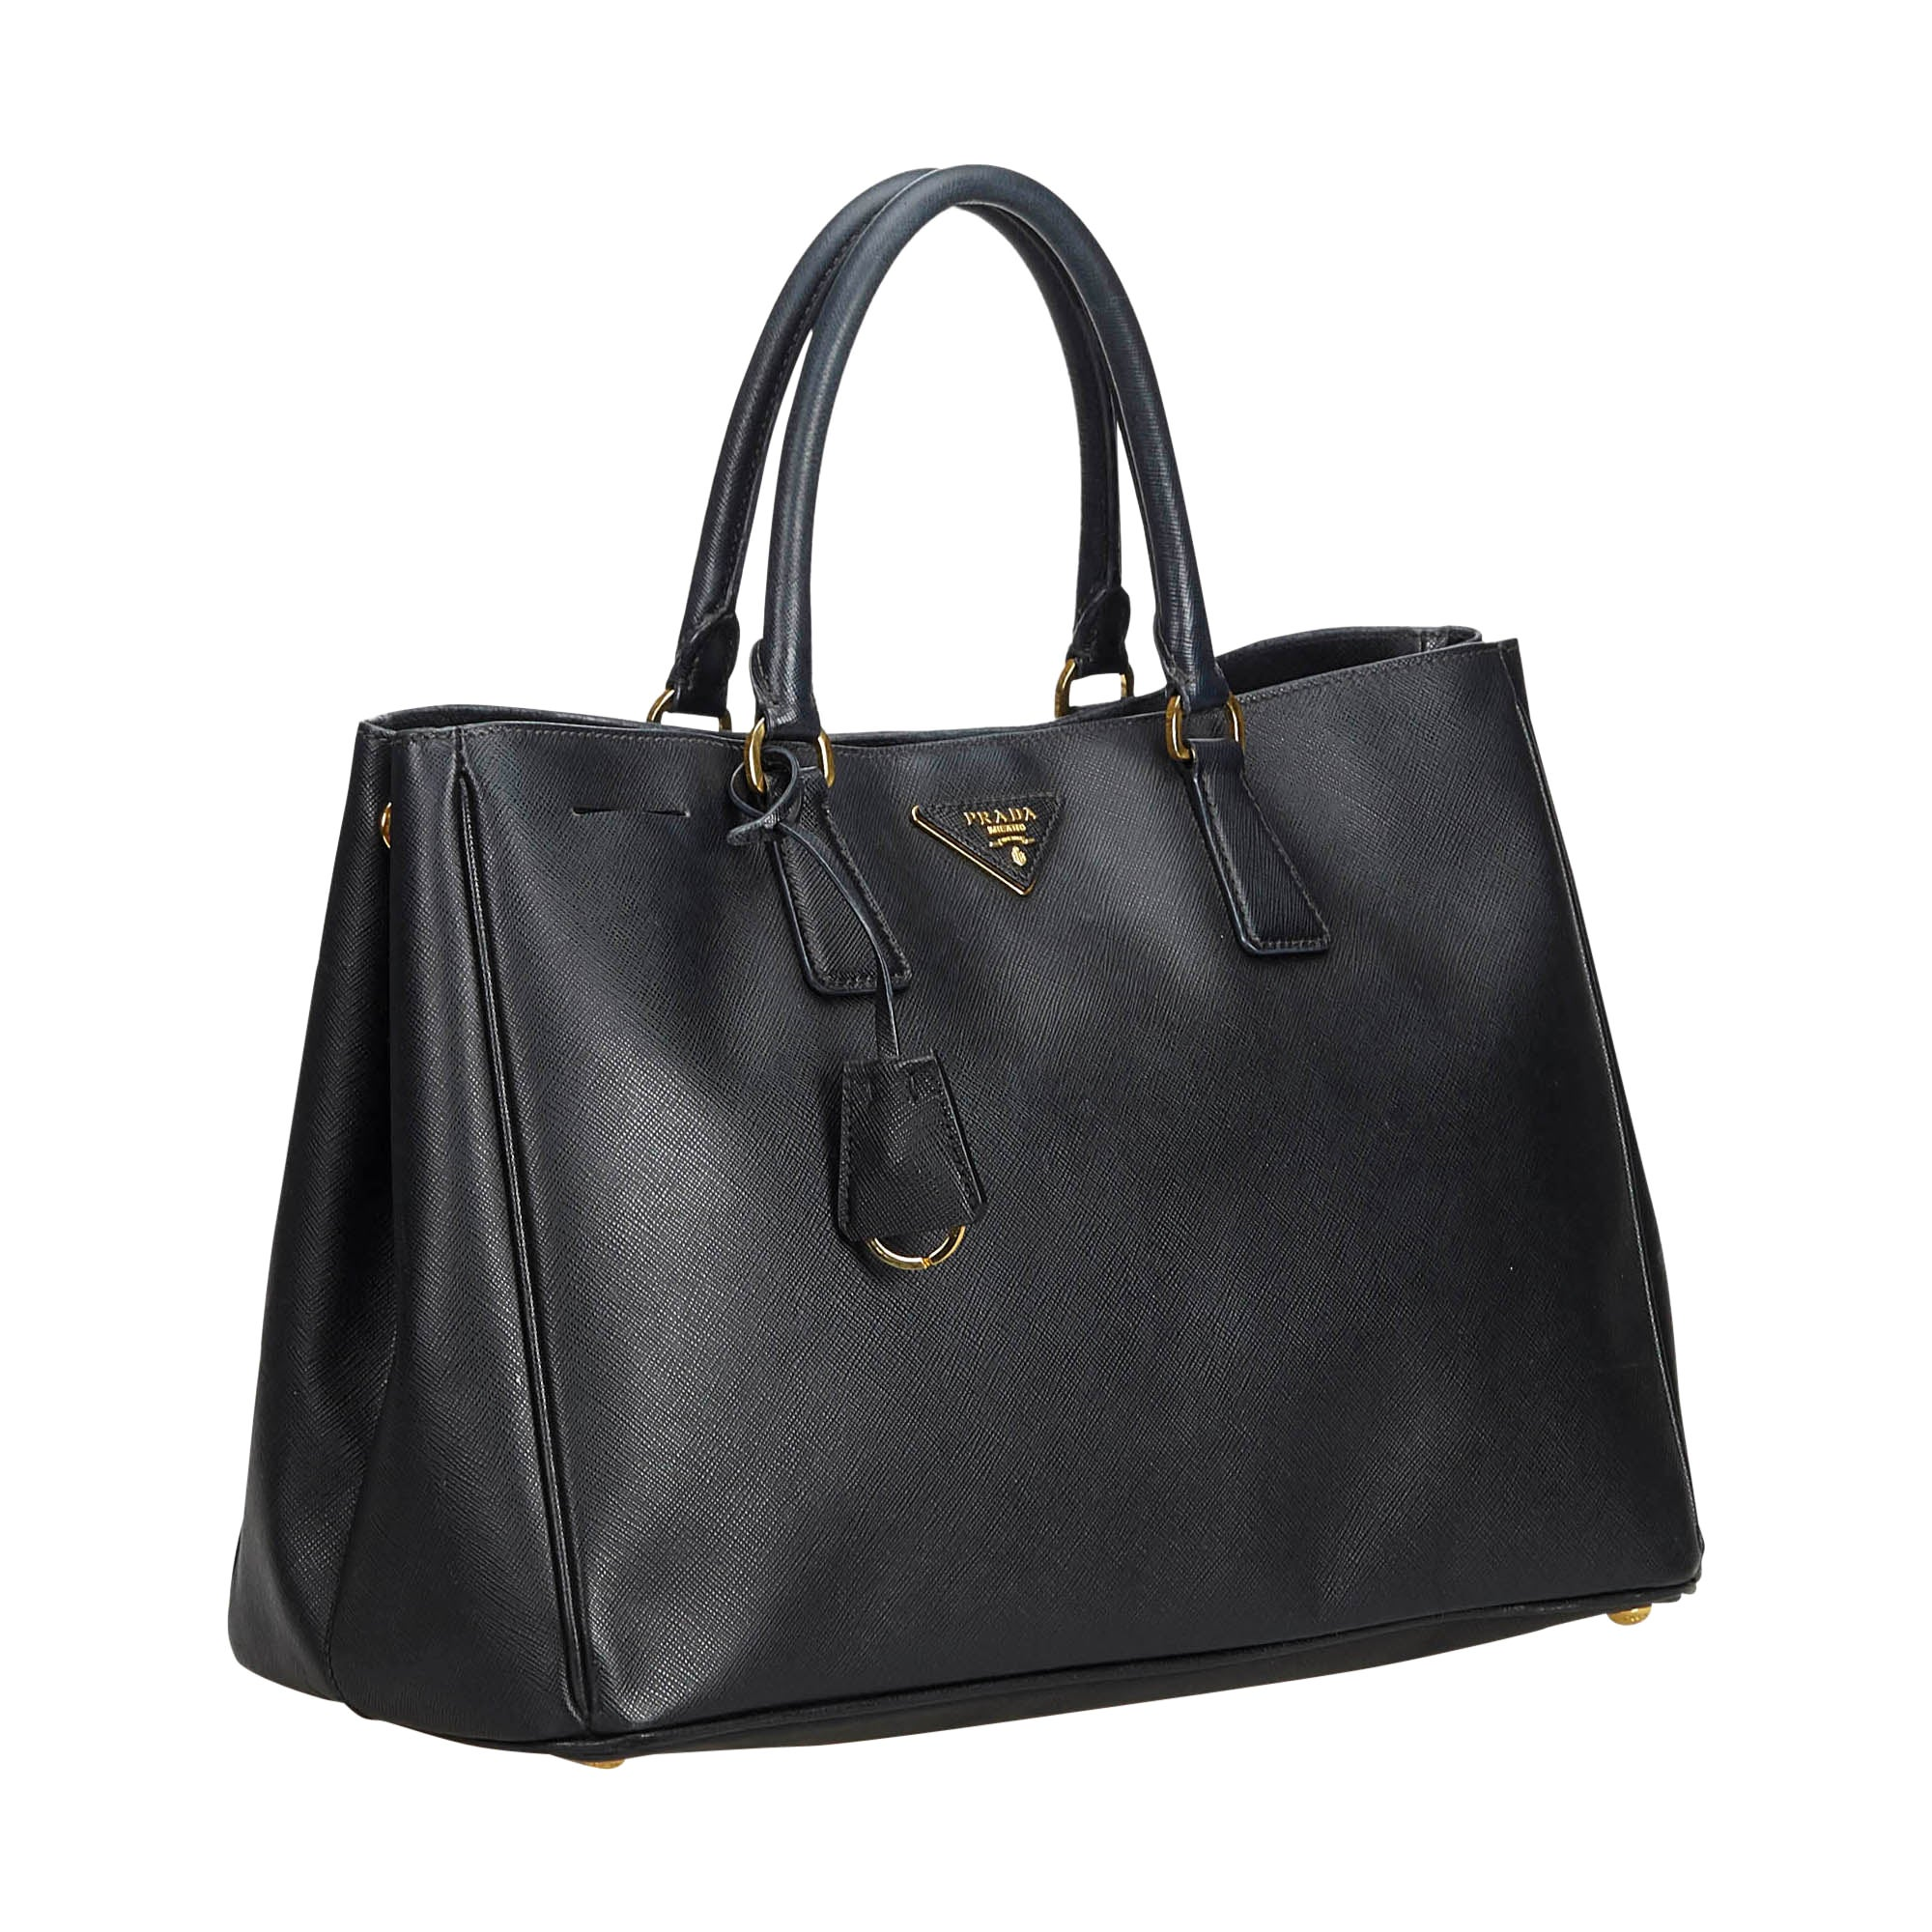 a931b5ab2617 Prada Black Leather Saffiano Galleria Handbag For Sale at 1stdibs